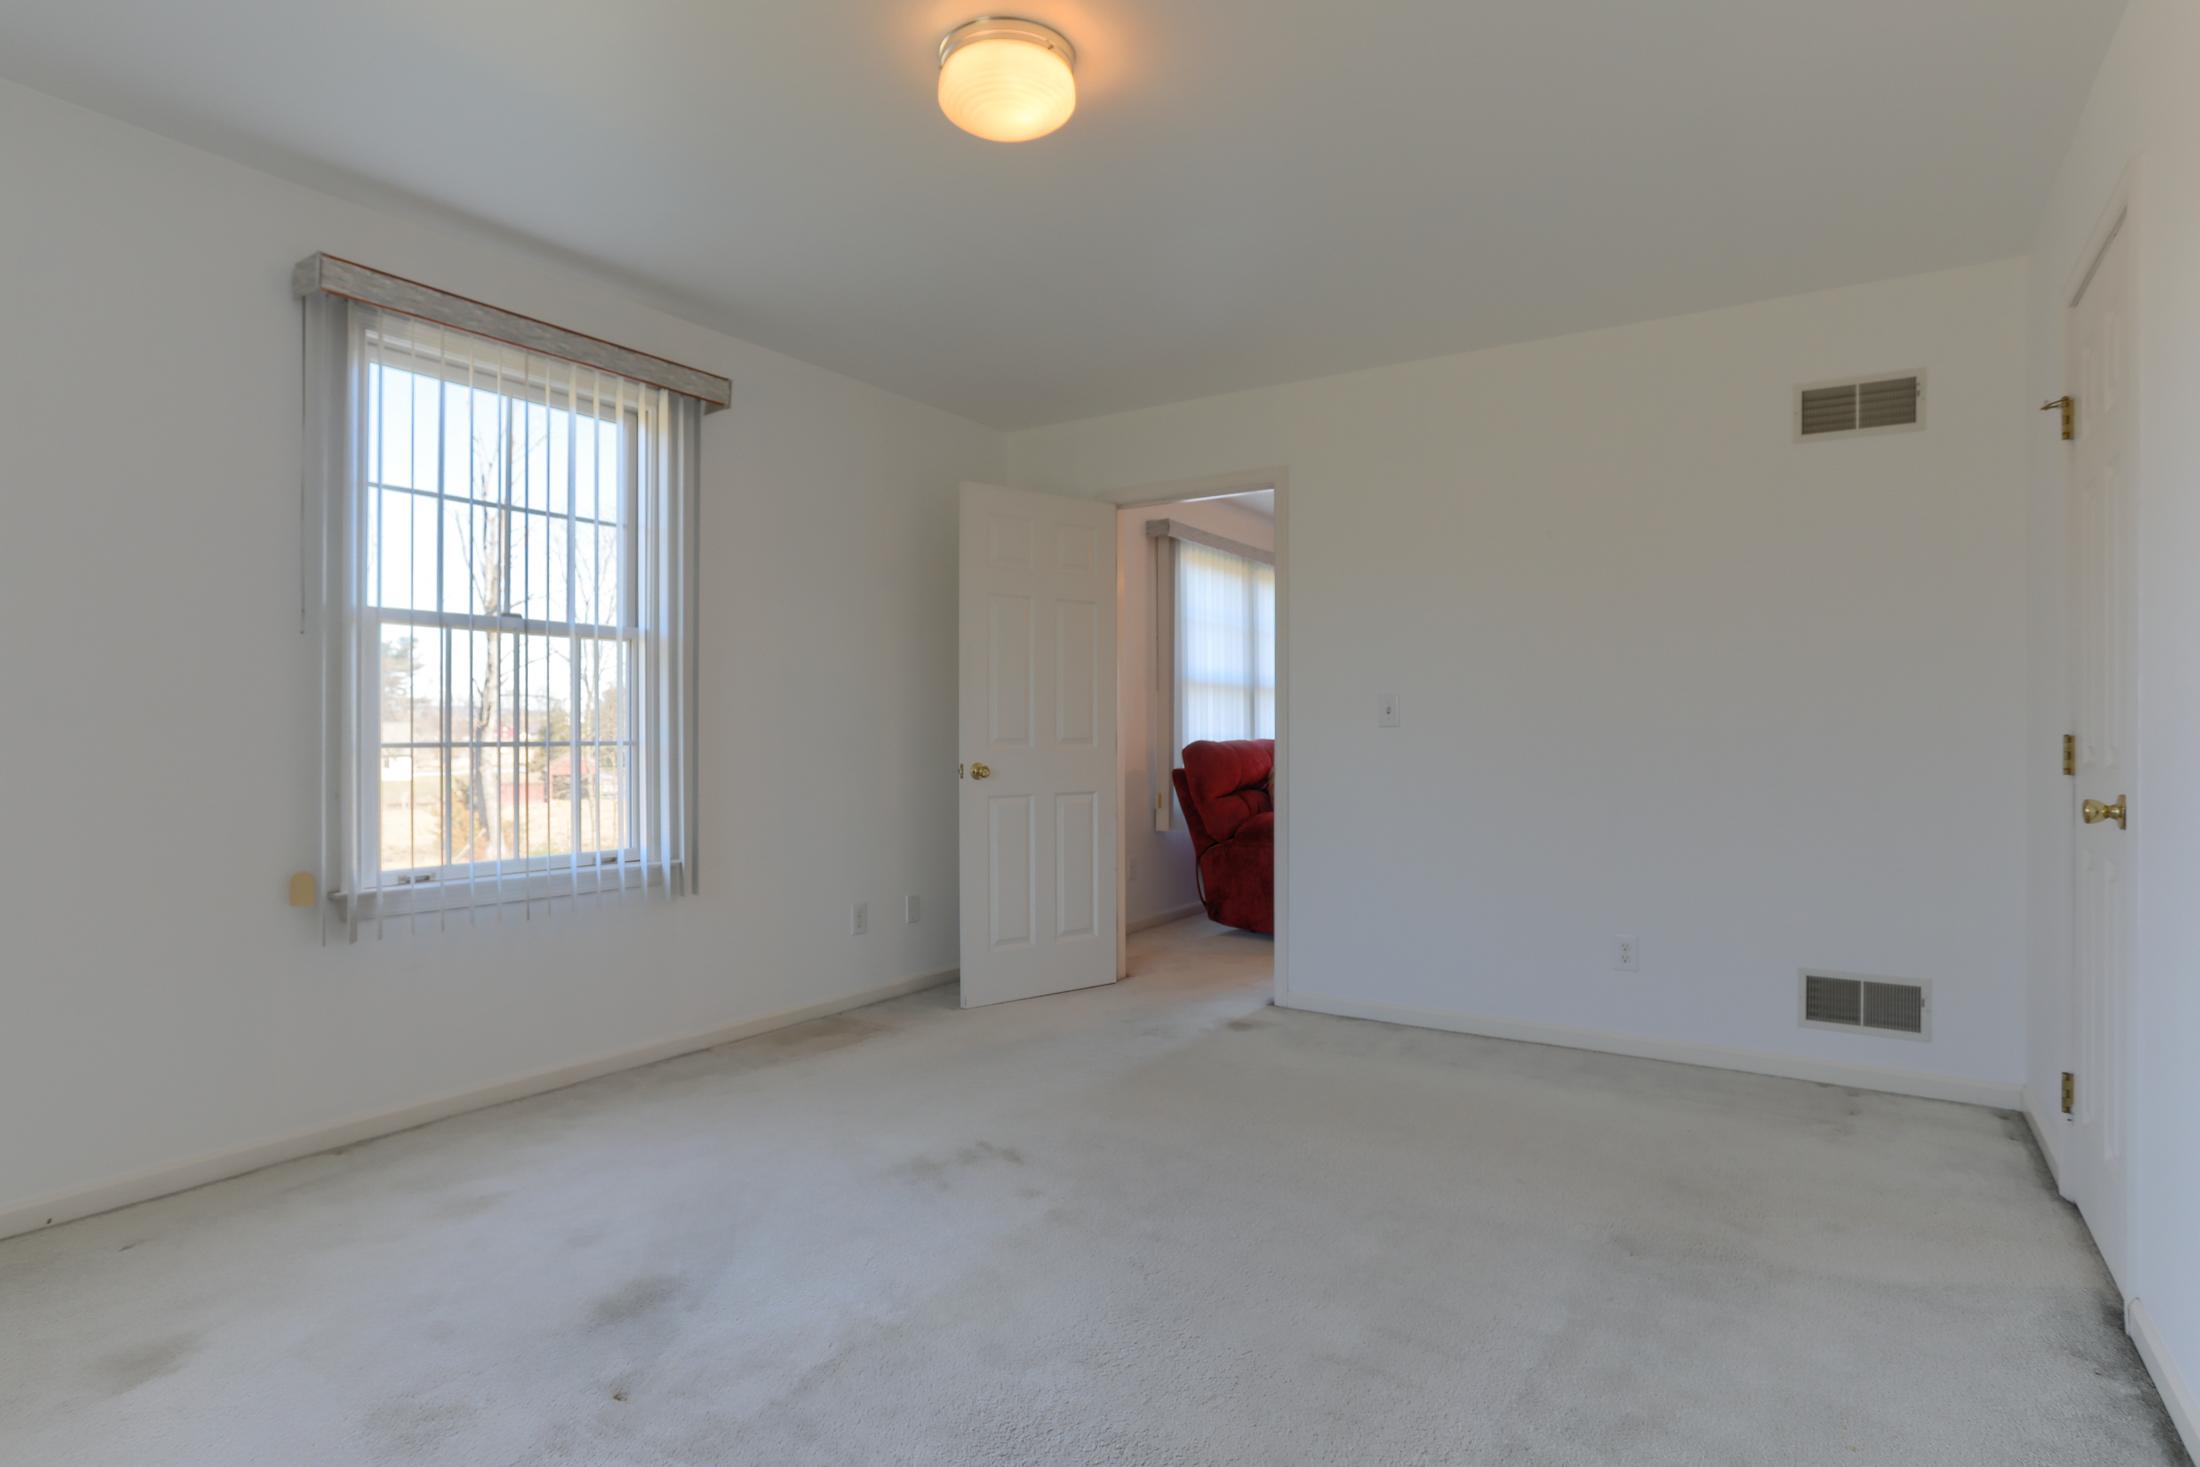 26 W. Strack Drive - Main bedroom 3